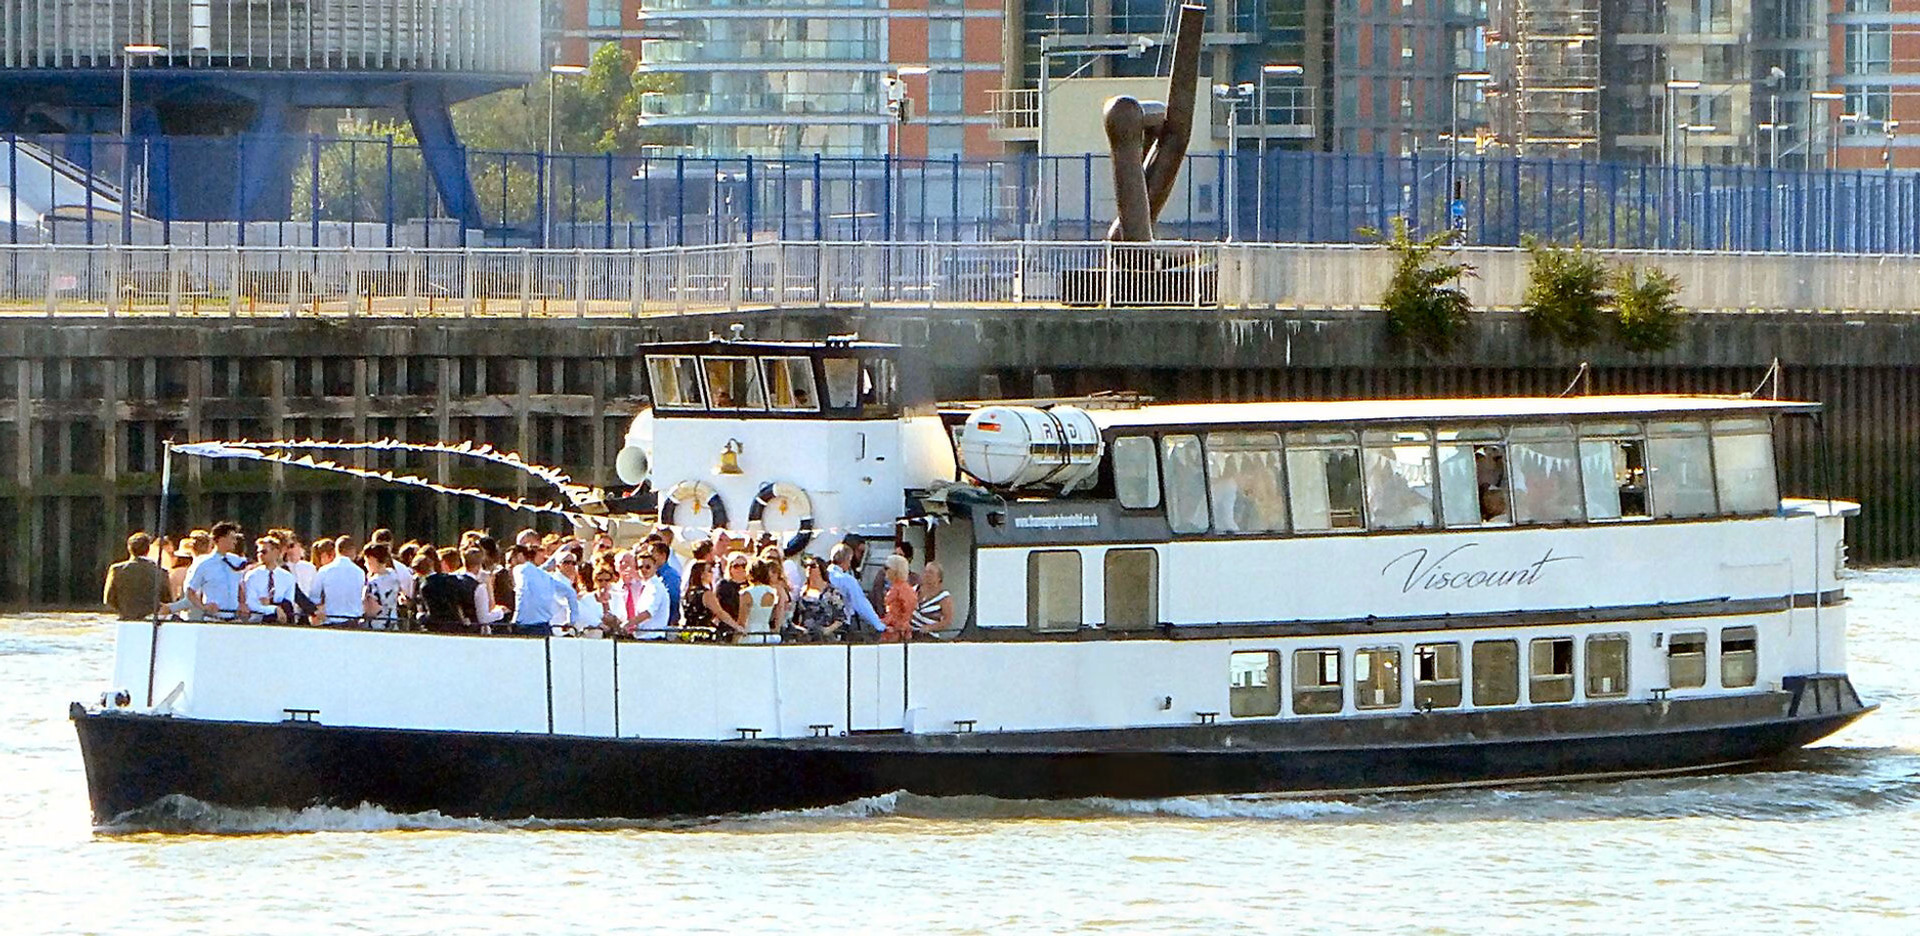 The MV Viscount Thames River Boat